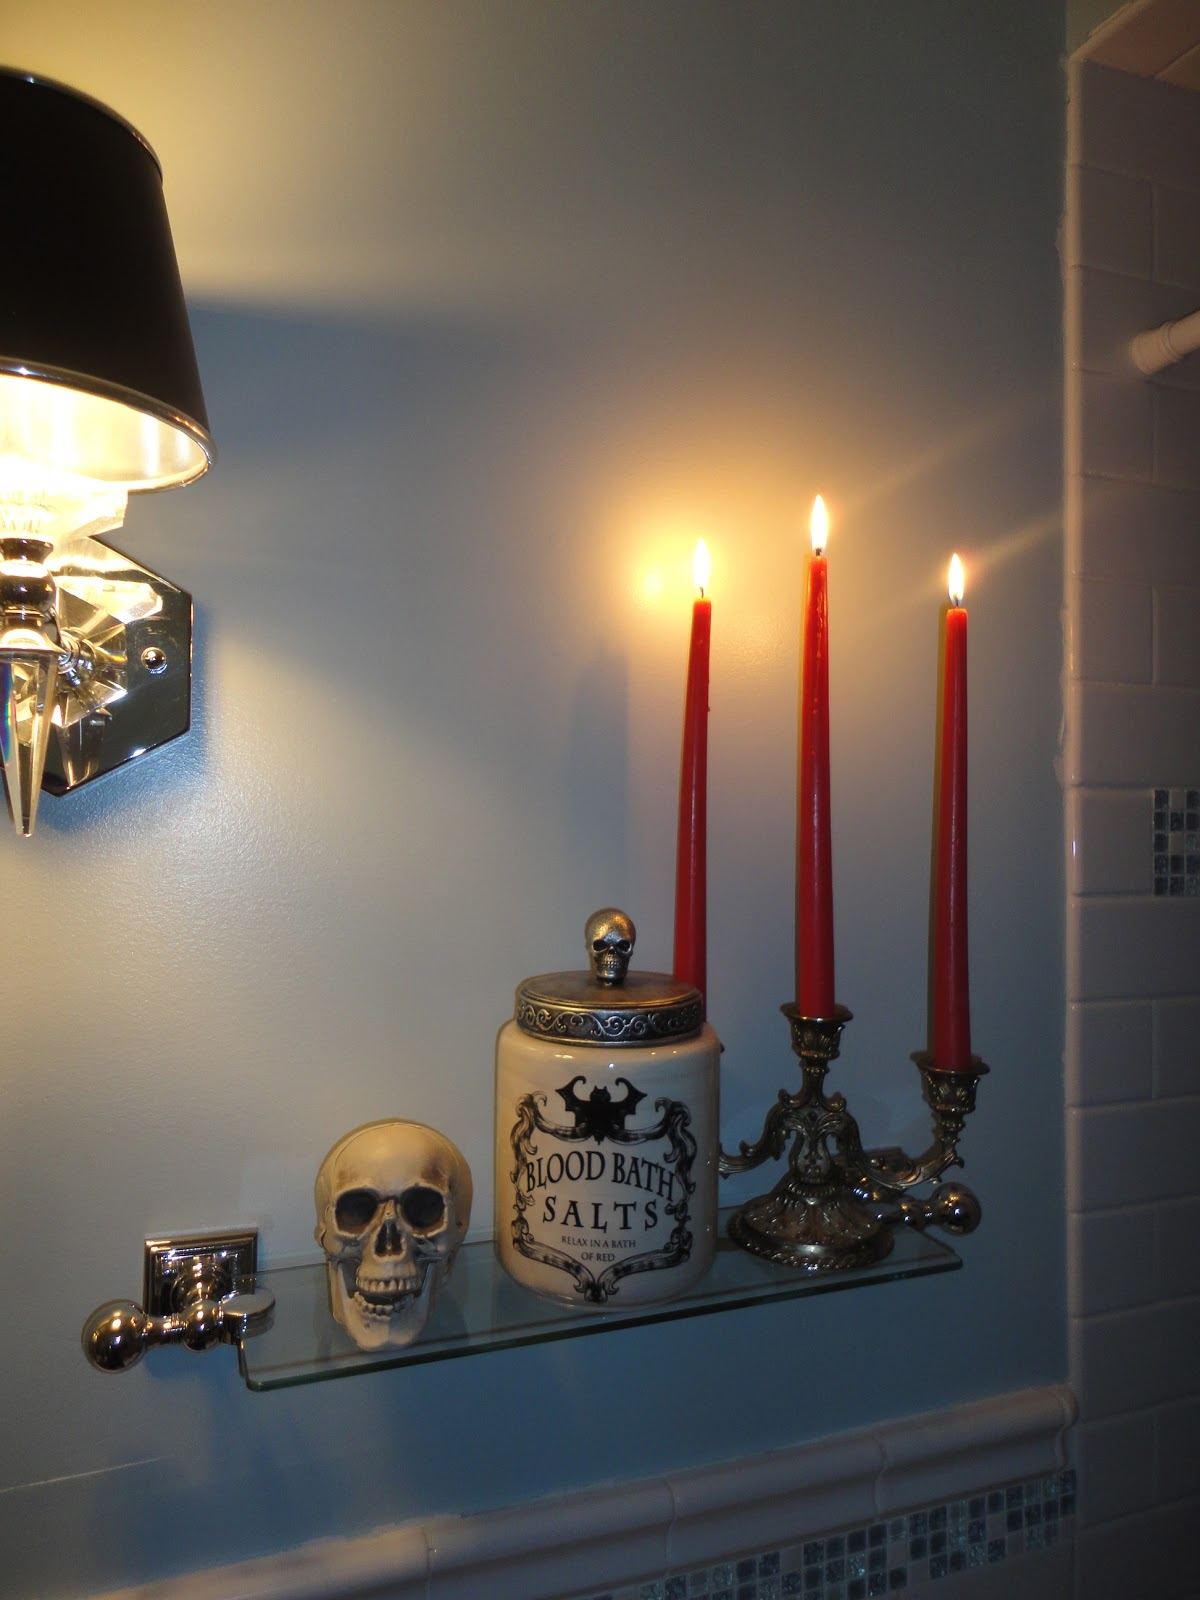 Skull Bathroom Decor: General Splendour : Autumn Window Box And Touches Of